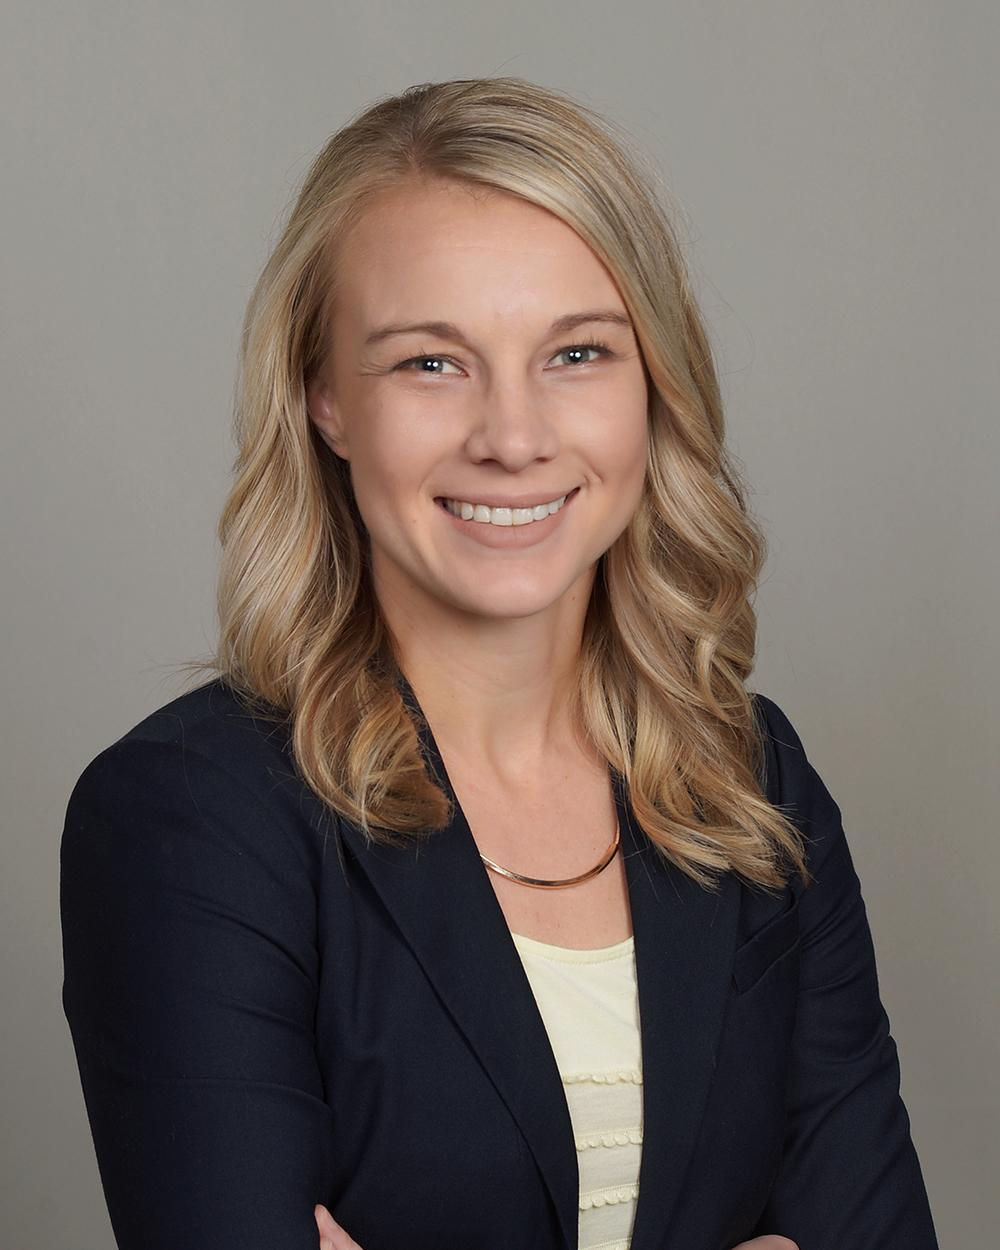 Profile Photo of Dr. Maggie Hedlund - None